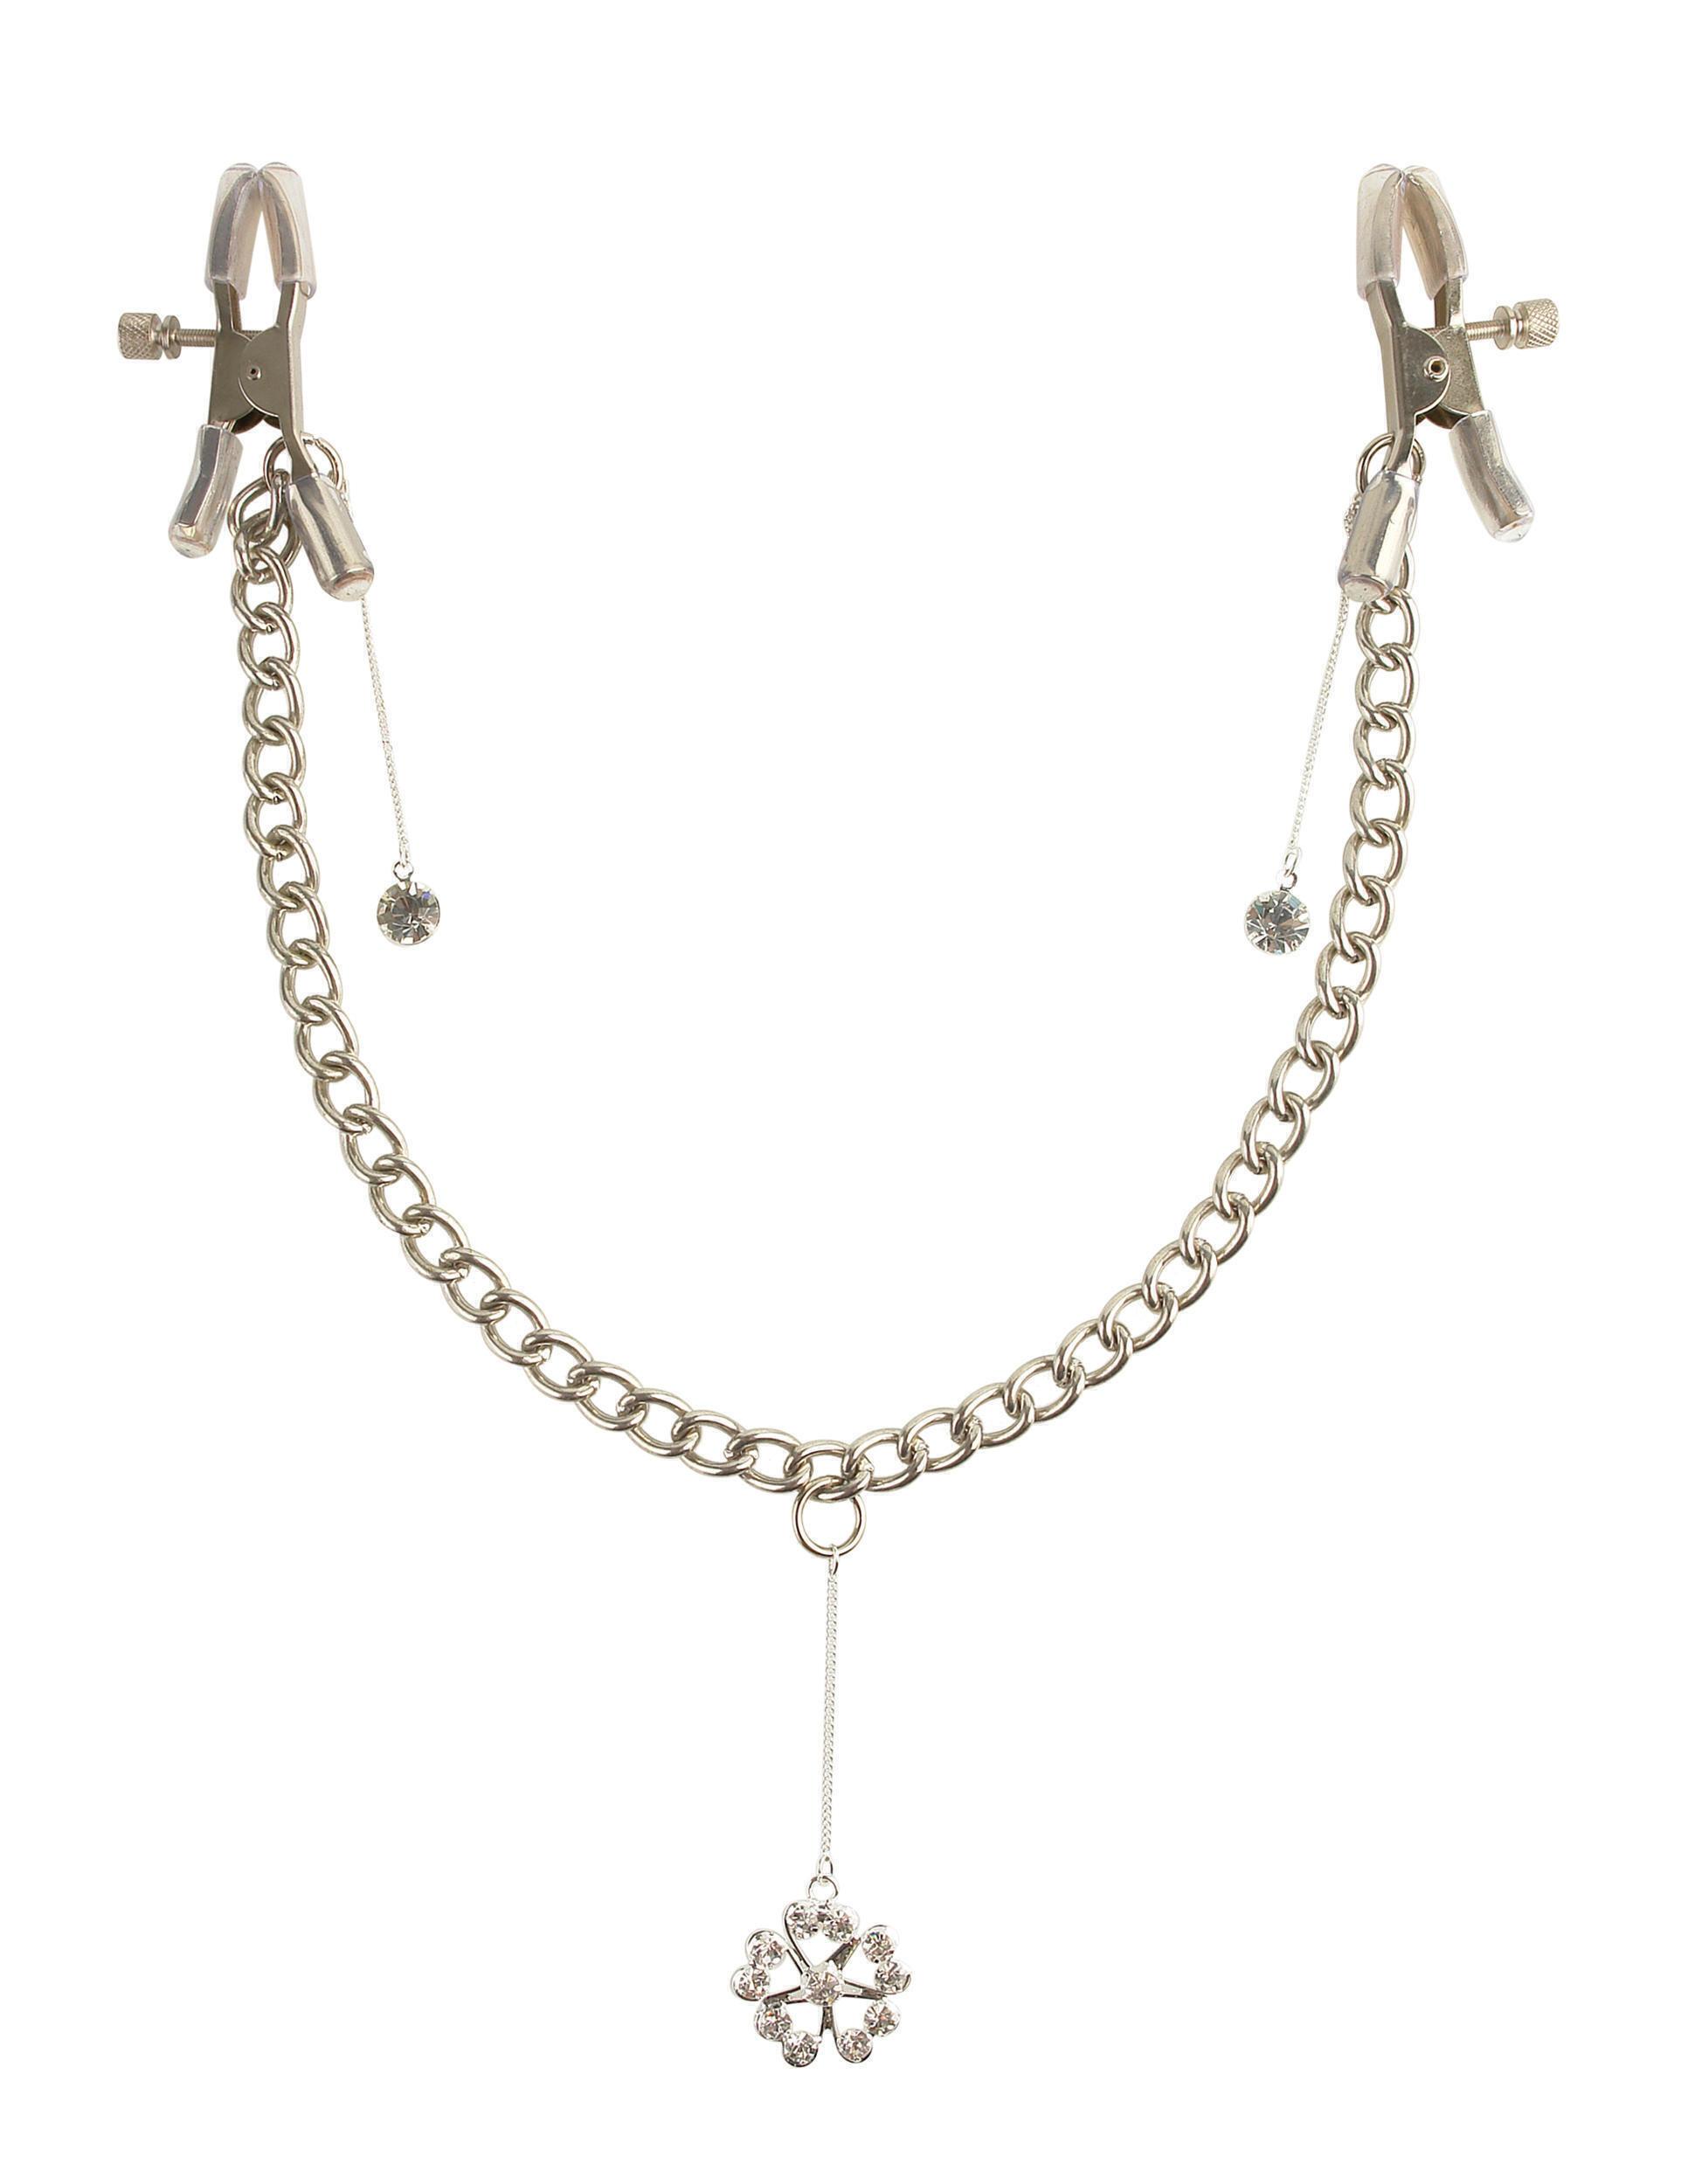 Зажимы на Соски Crystal Nipple Clamps